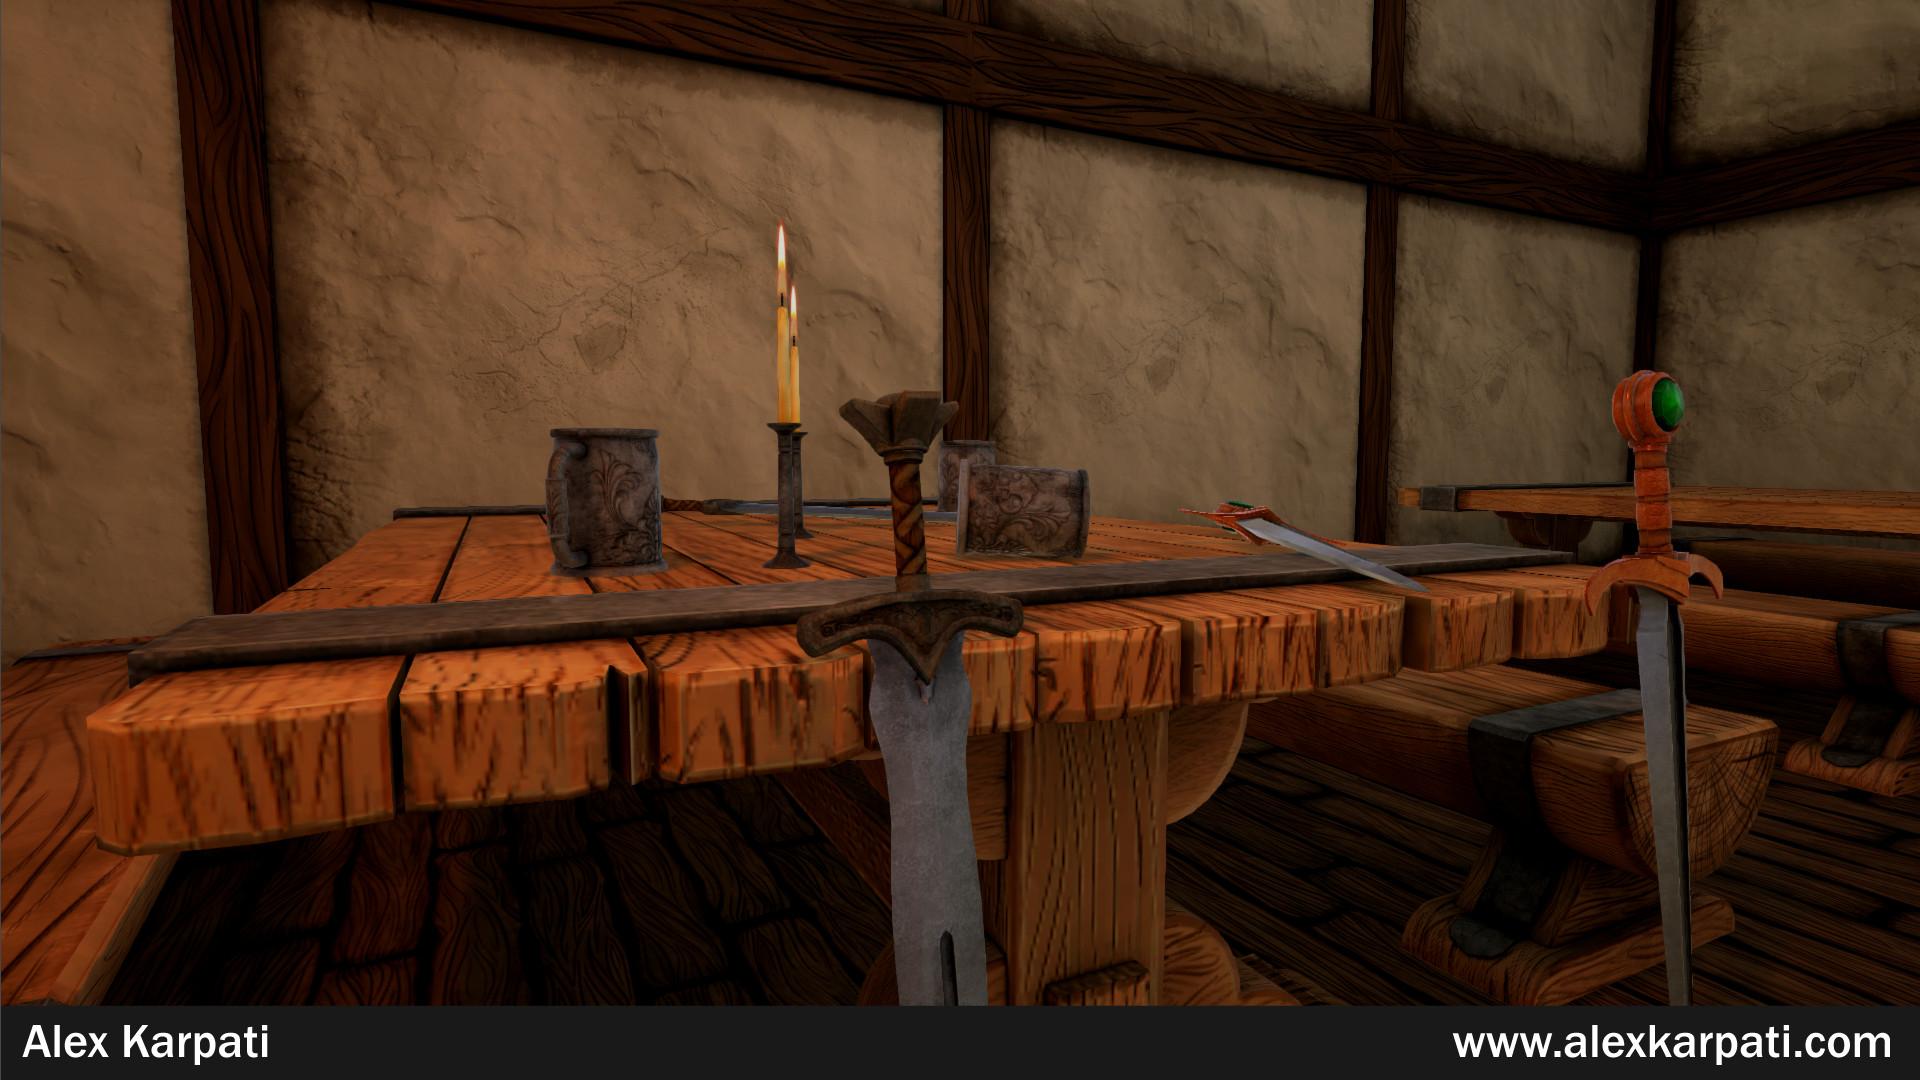 Alex karpati tavern 03 v01